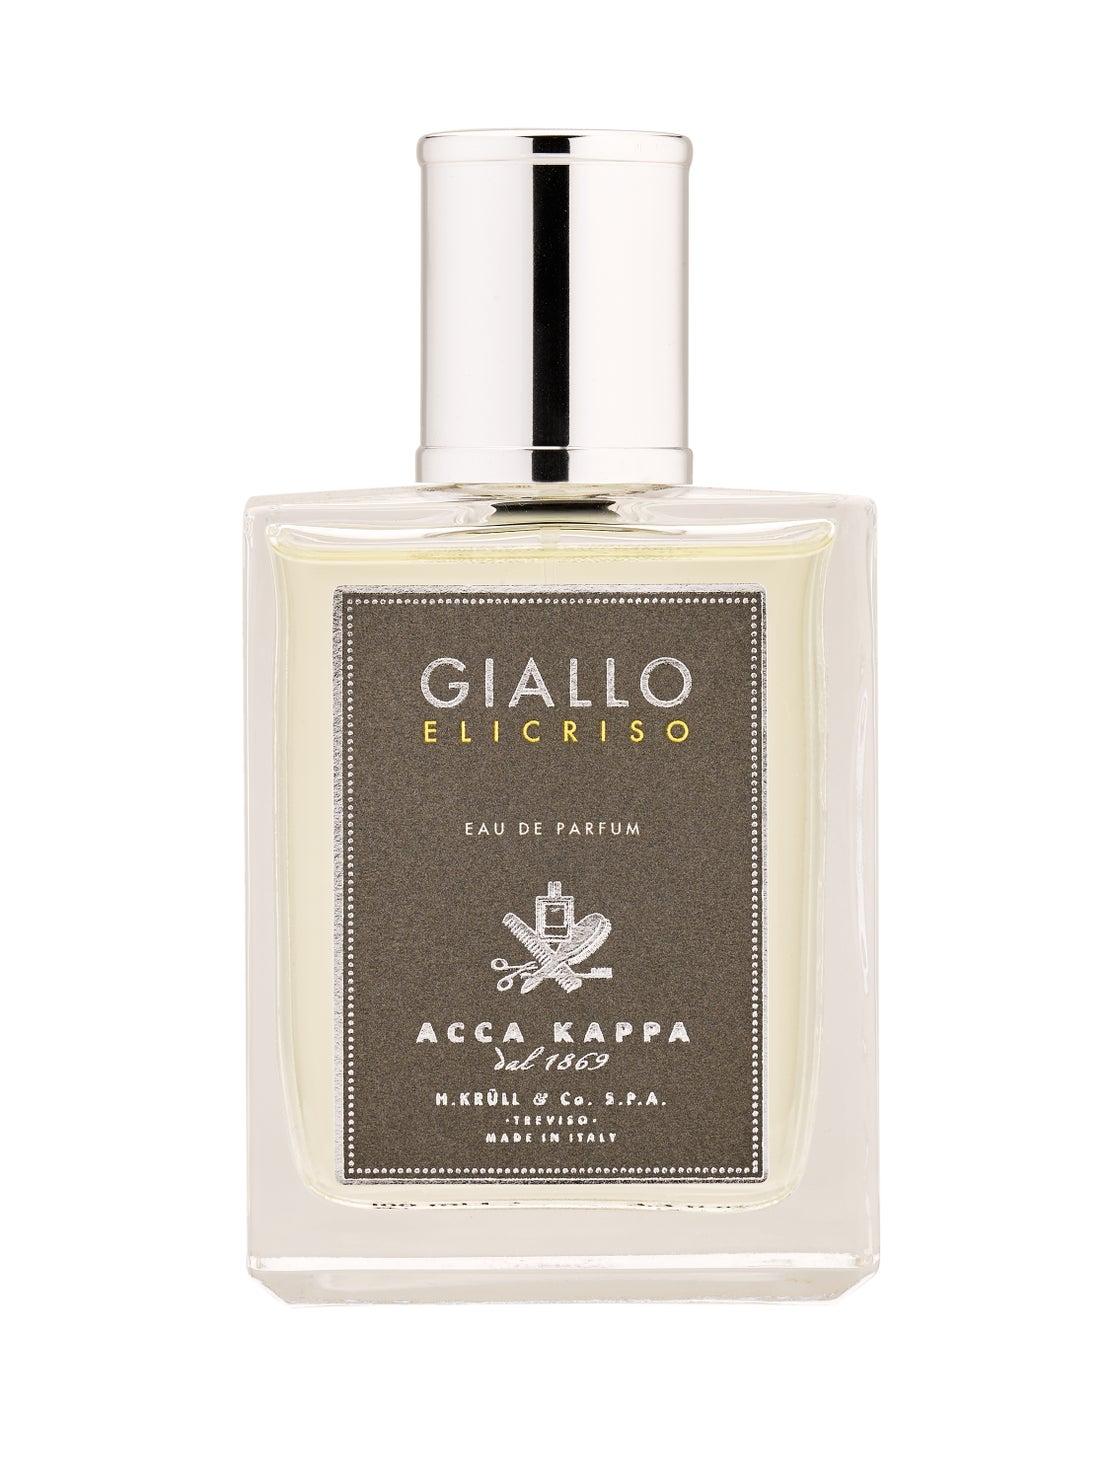 Acca Kappa - Giallo Elicriso eau de Parfum (100ml)